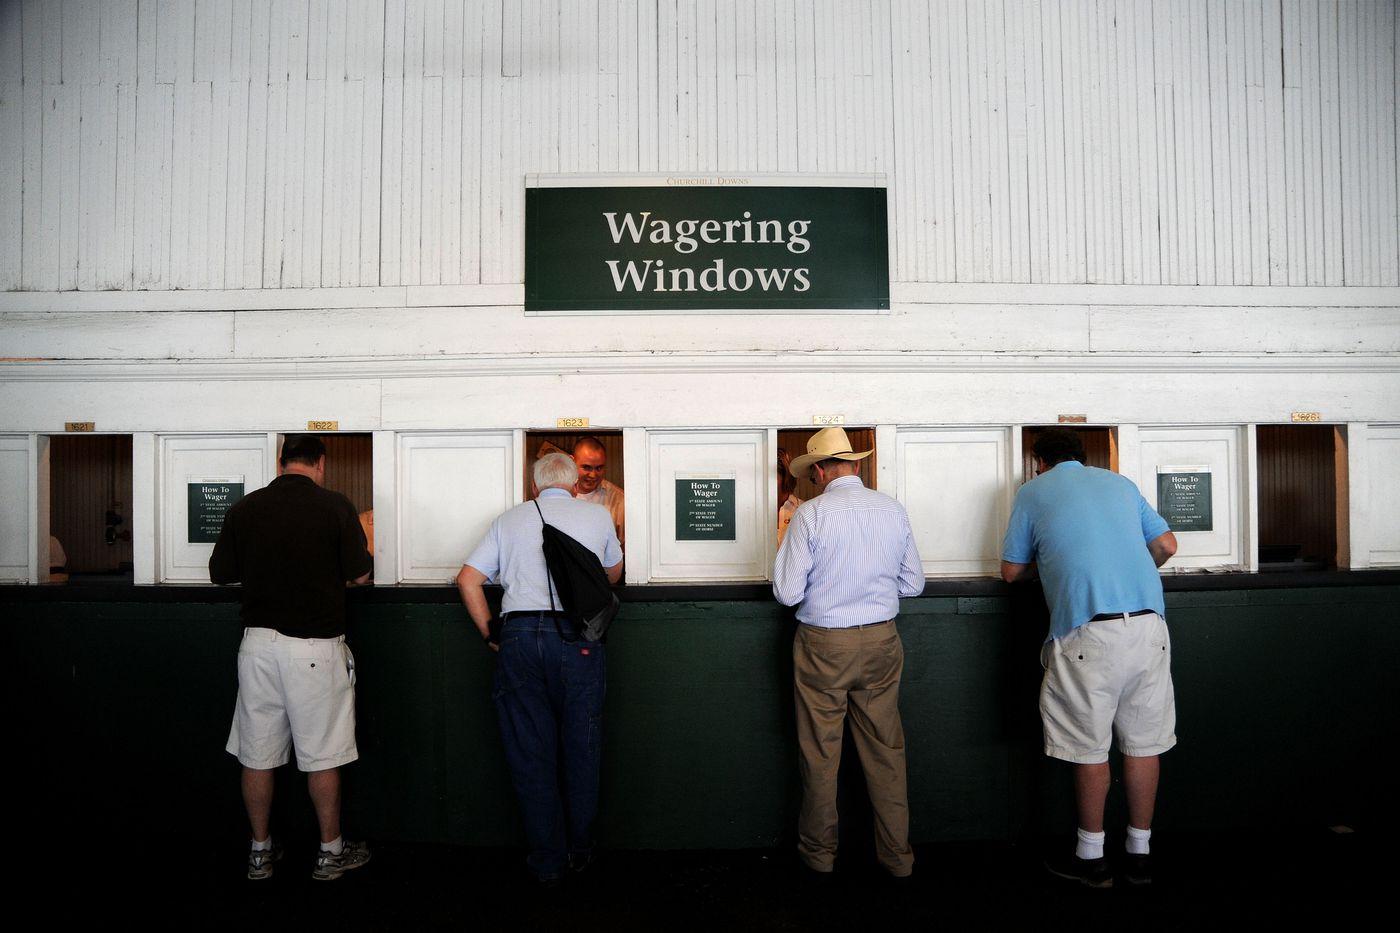 Horse betting terms napa richard bettinger dallas/fort worth area